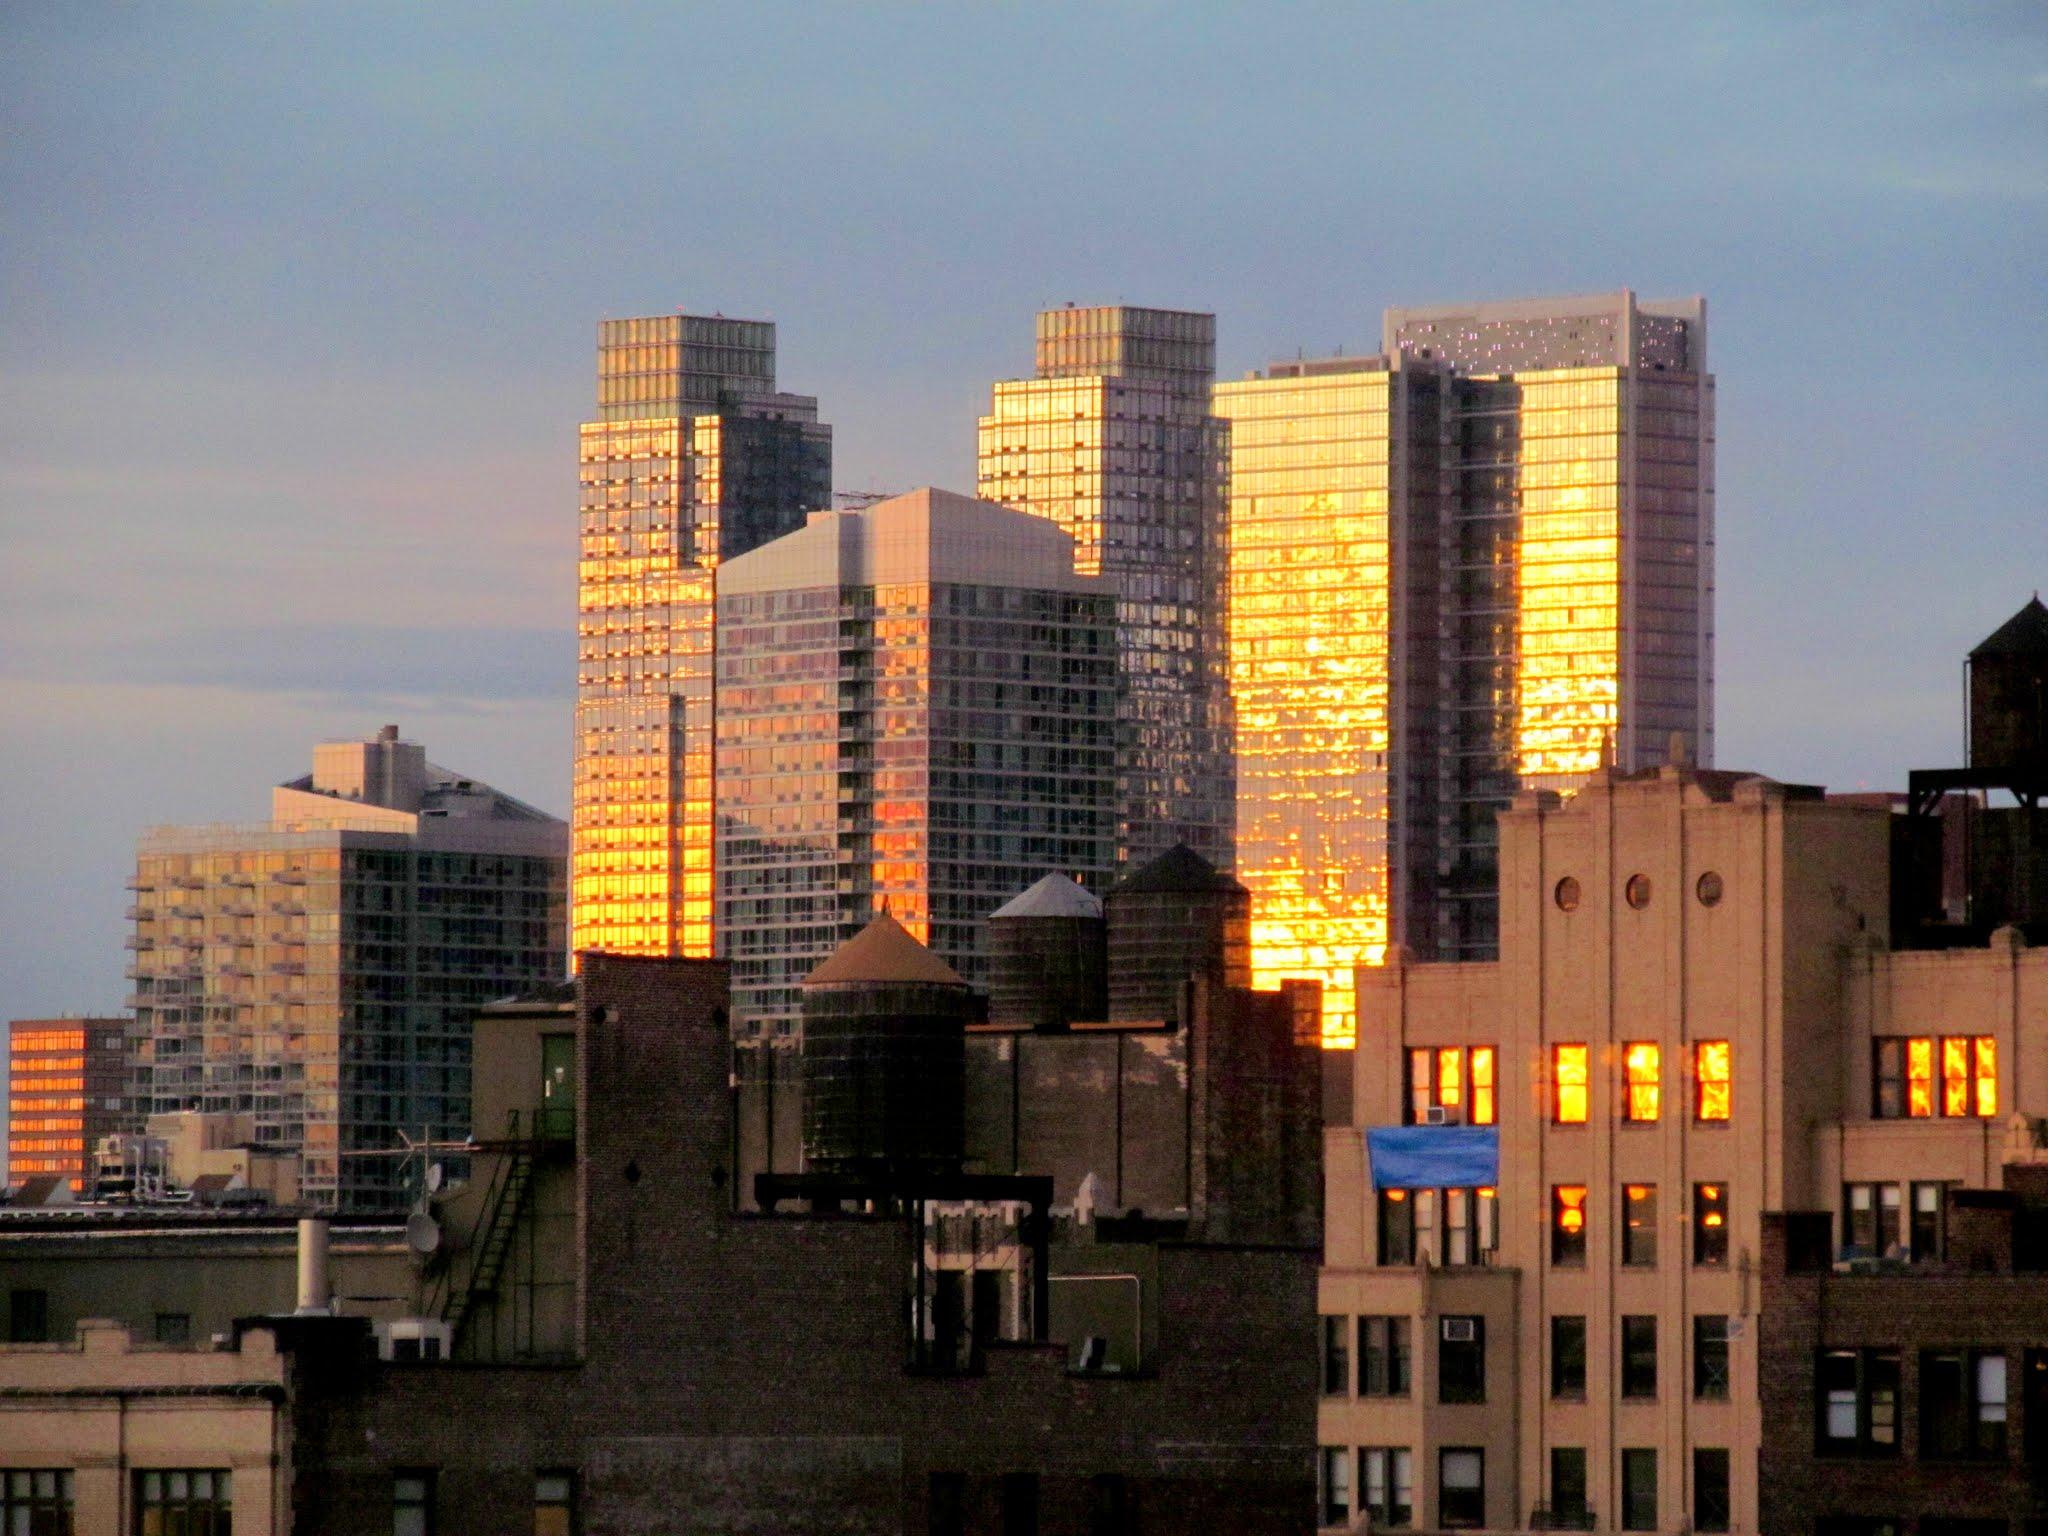 Photo: Sunset light on buildings